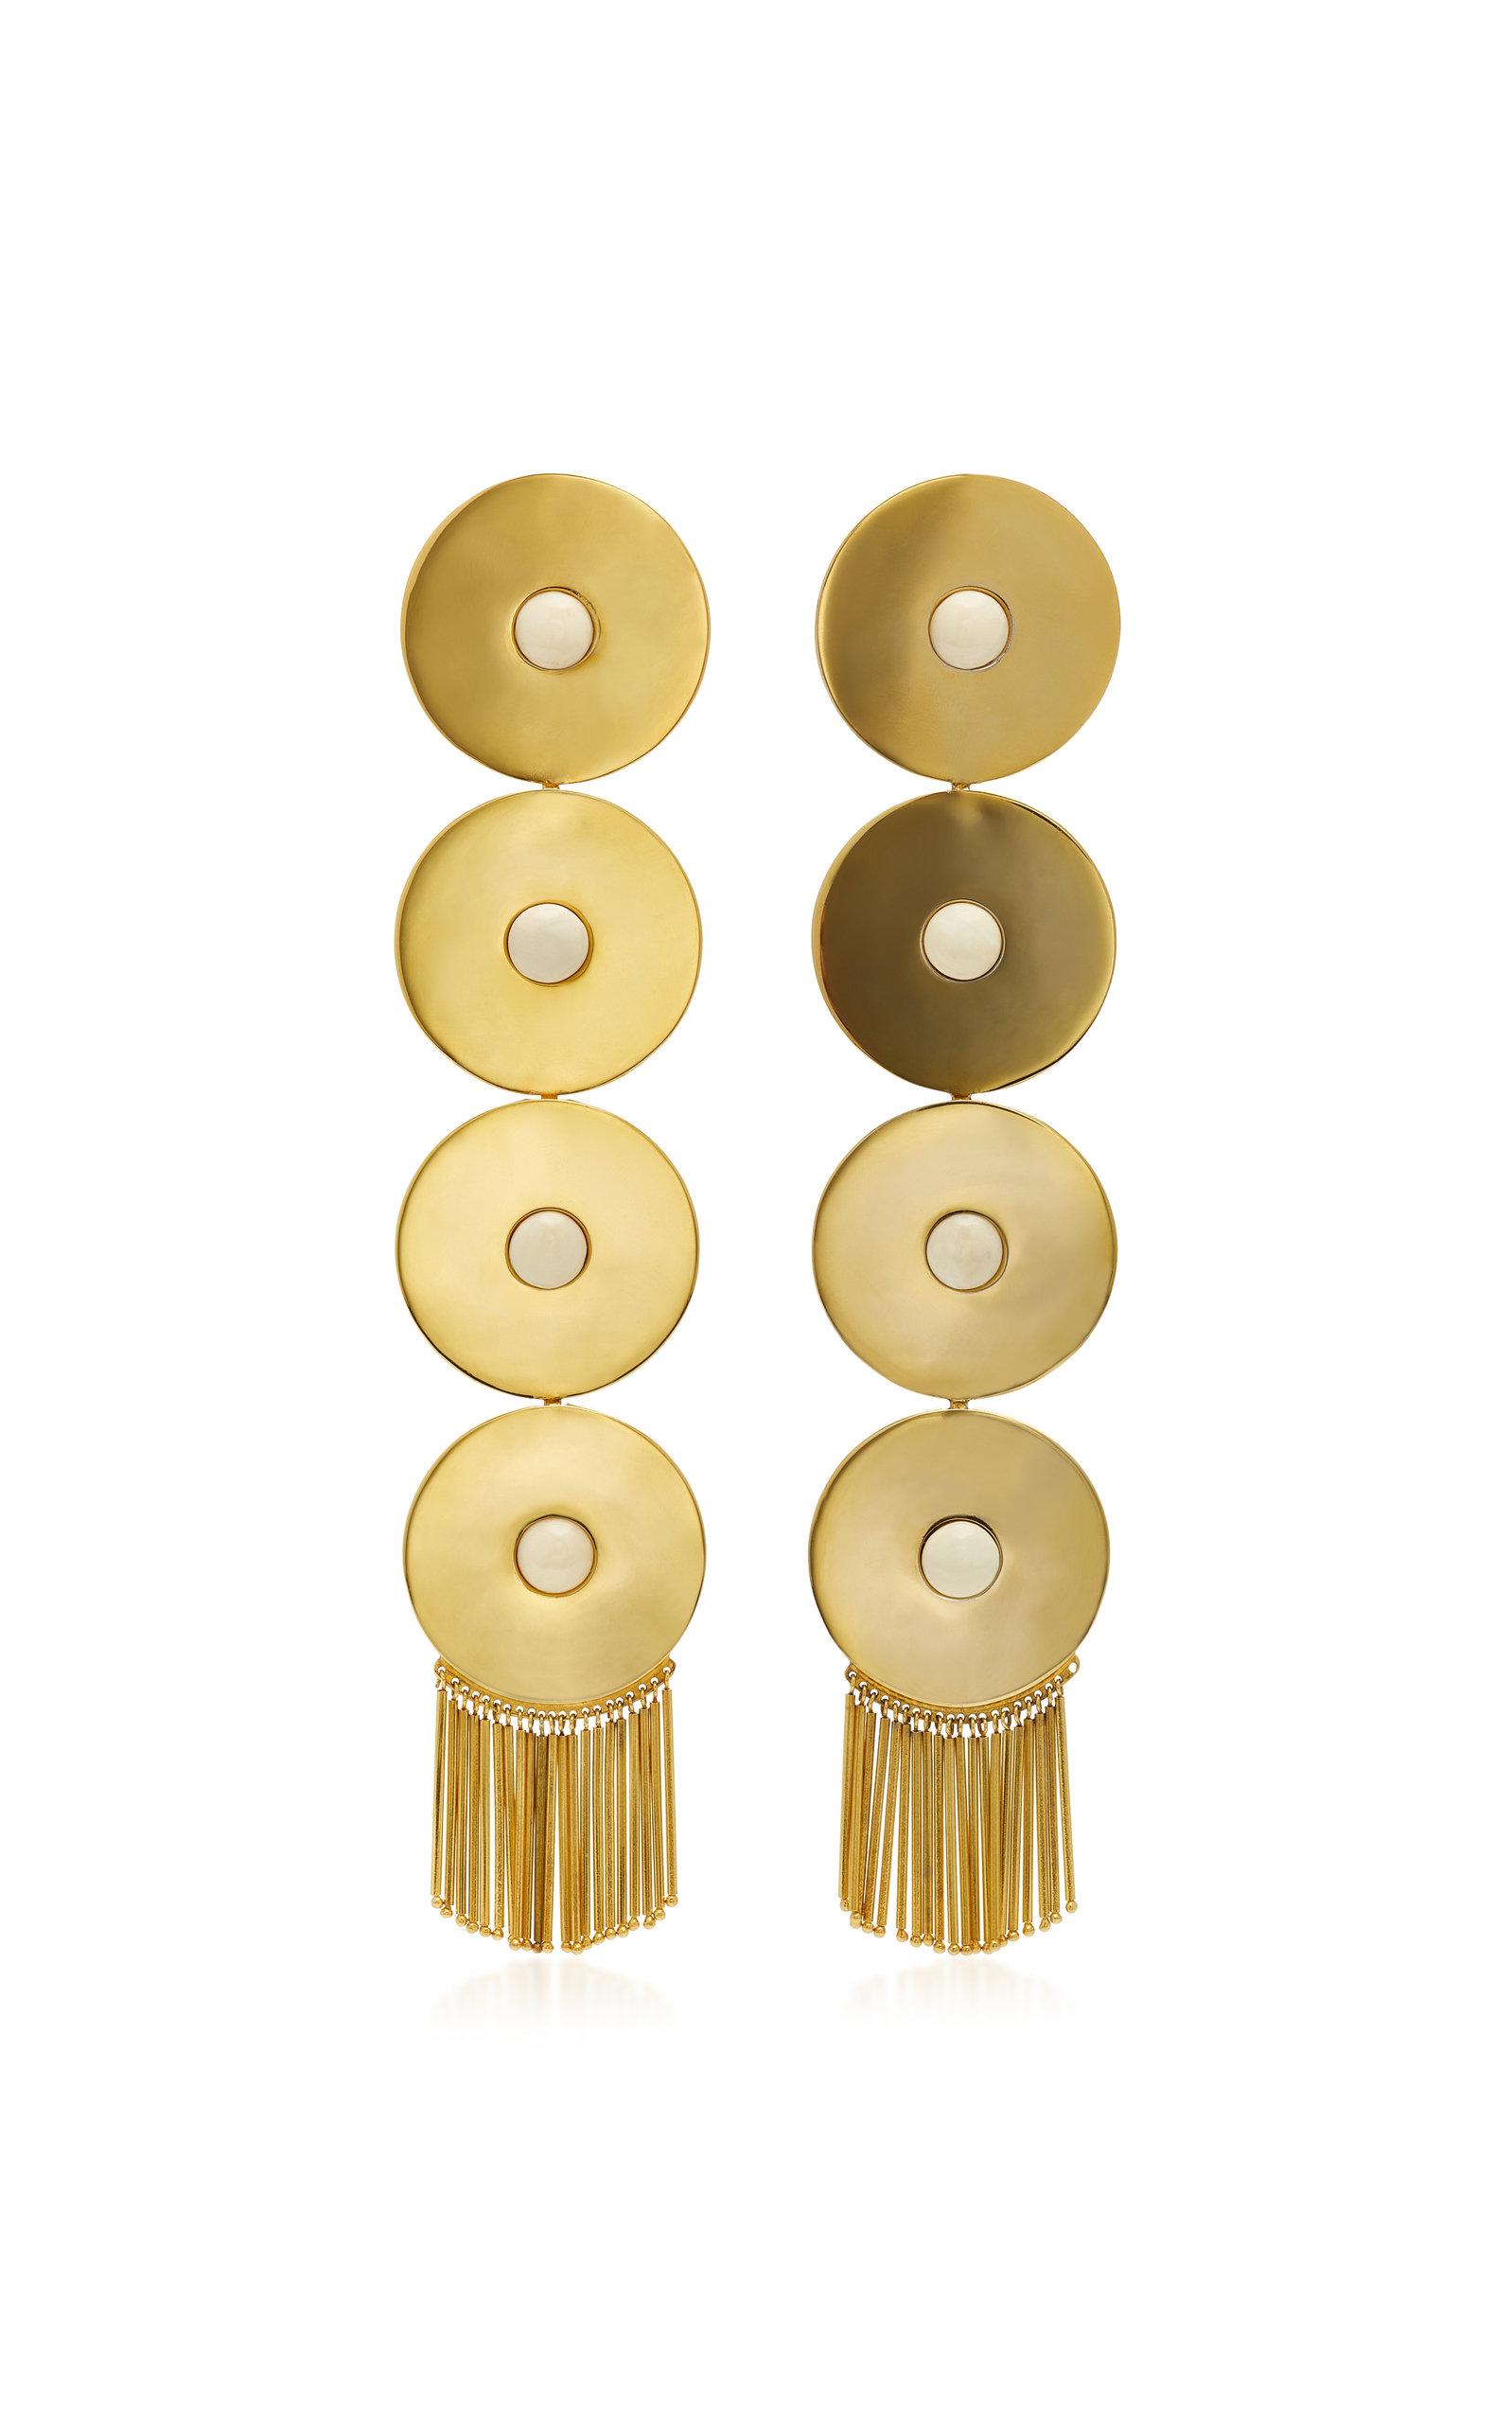 MONICA SORDO ICA GOLD-PLATED DROP EARRINGS